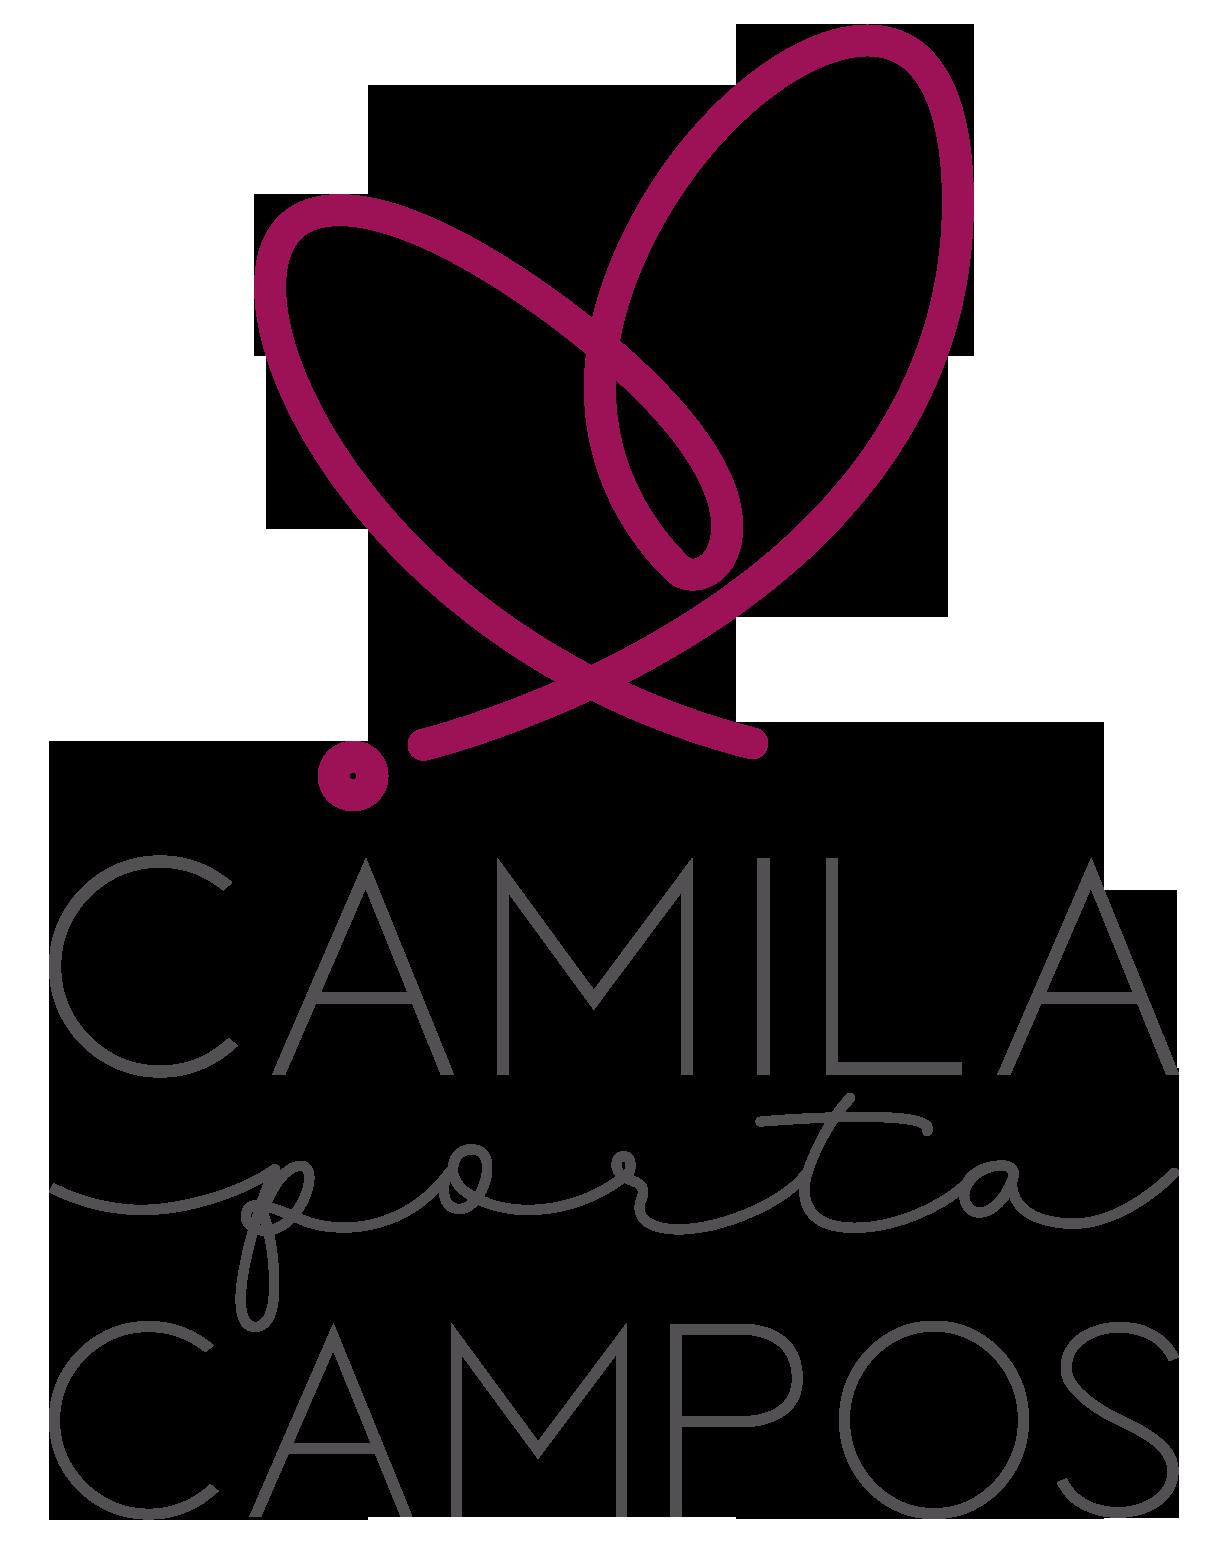 Camila Porta Campos